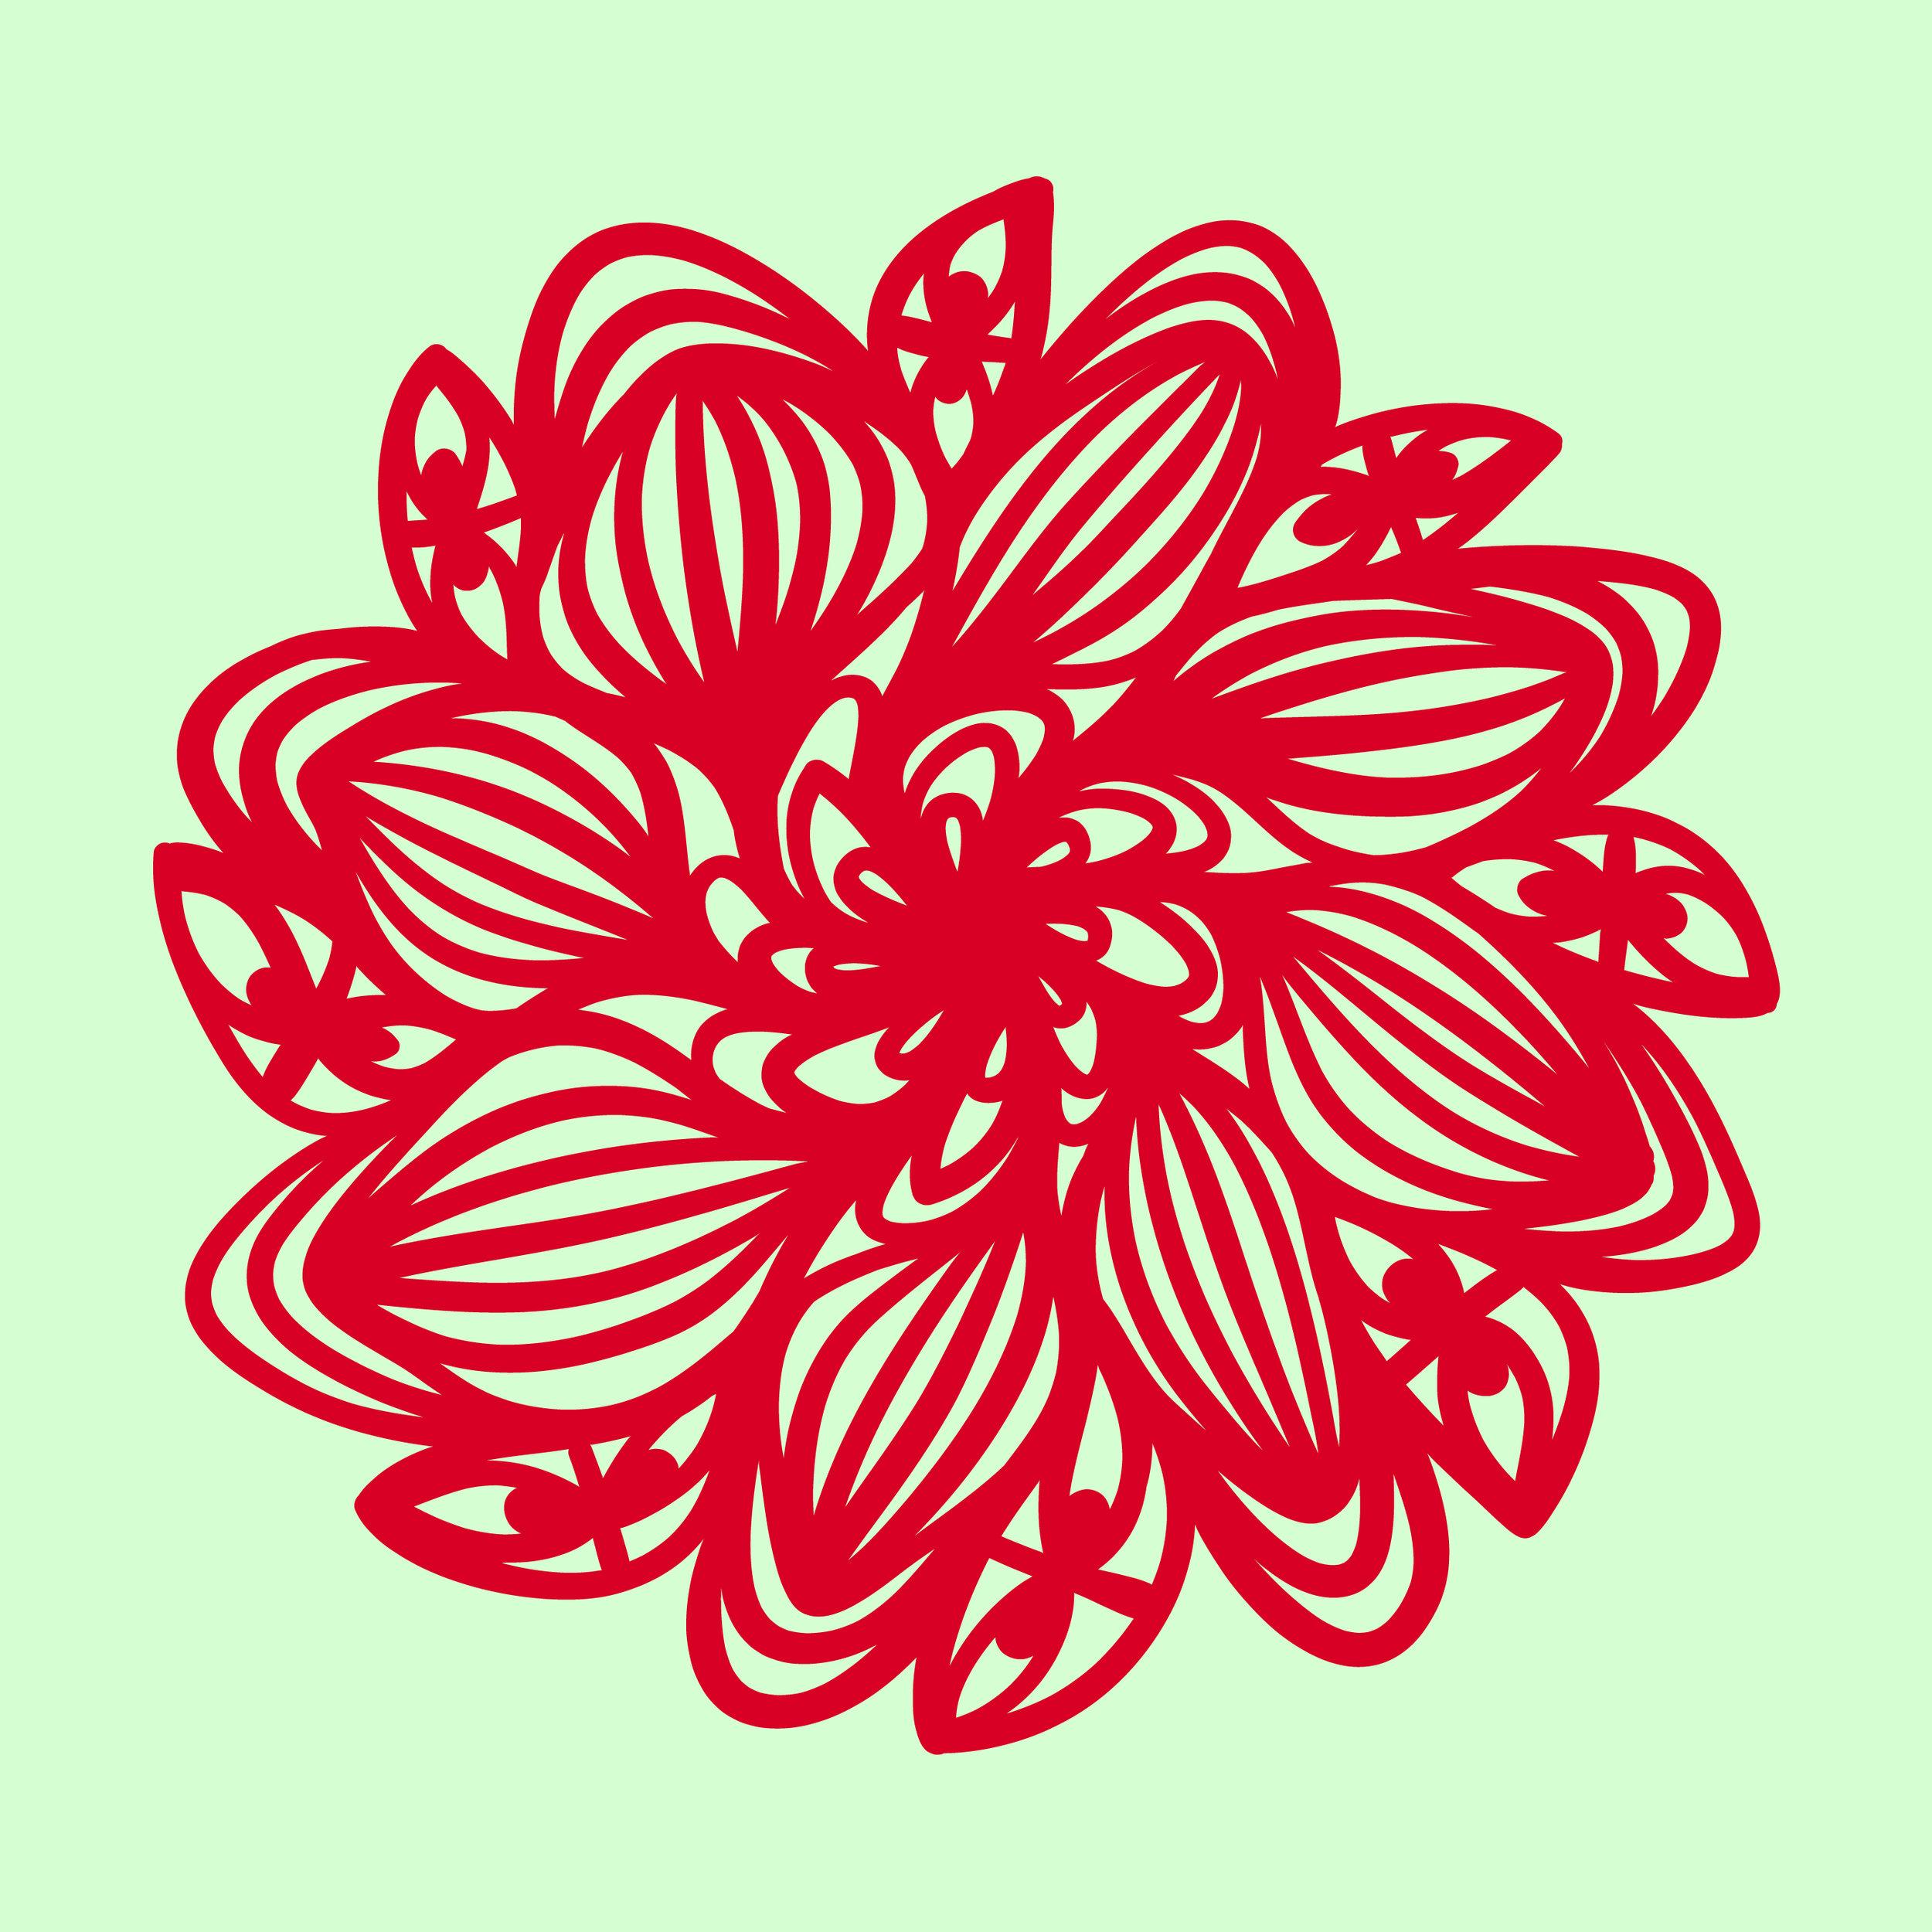 wineberry flower 1b.jpg